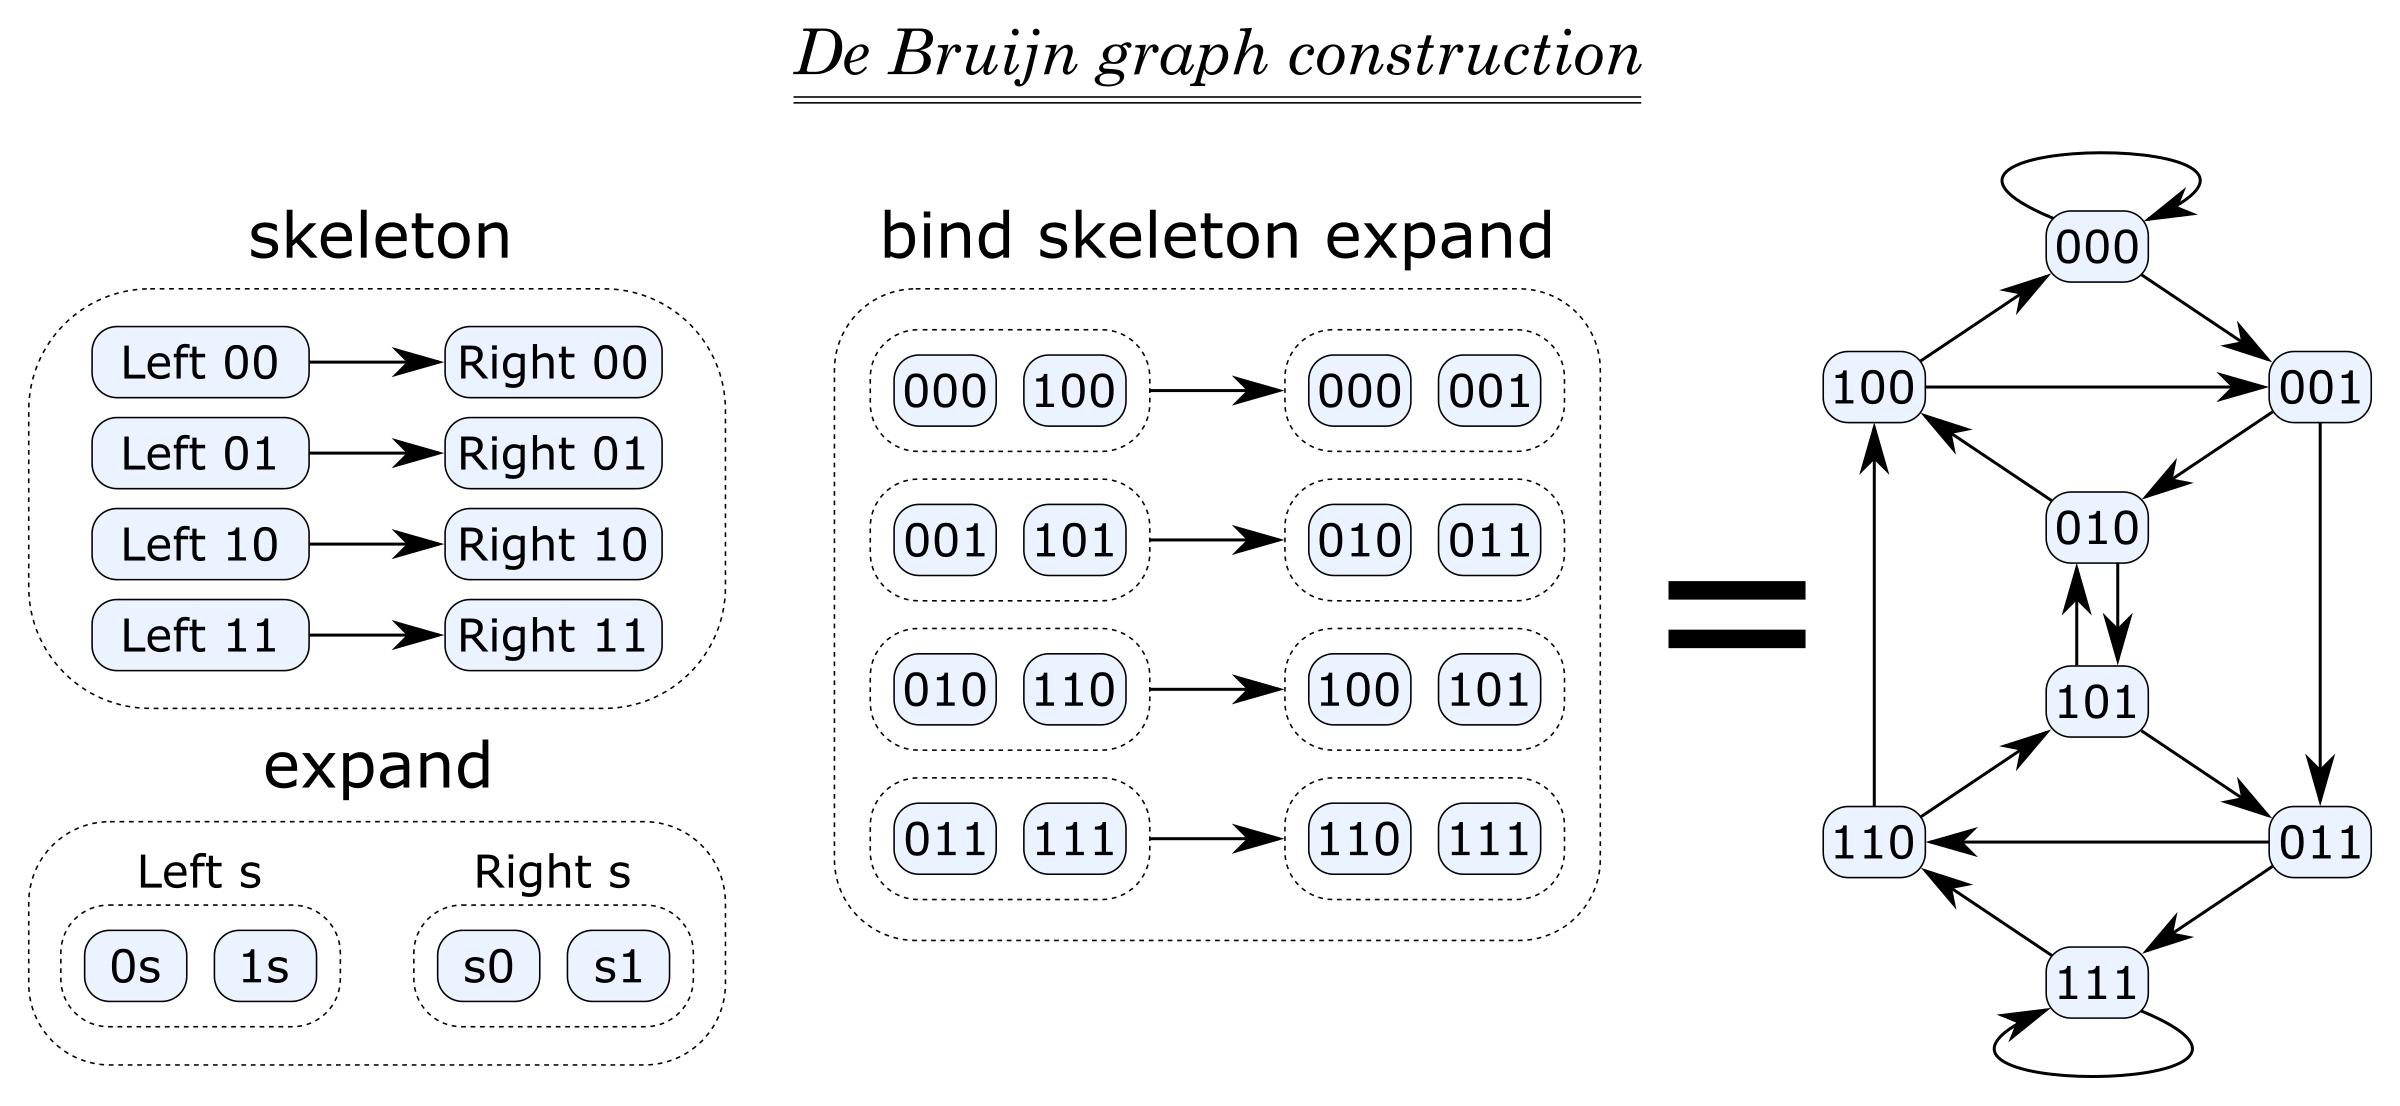 De Bruijn graph construction